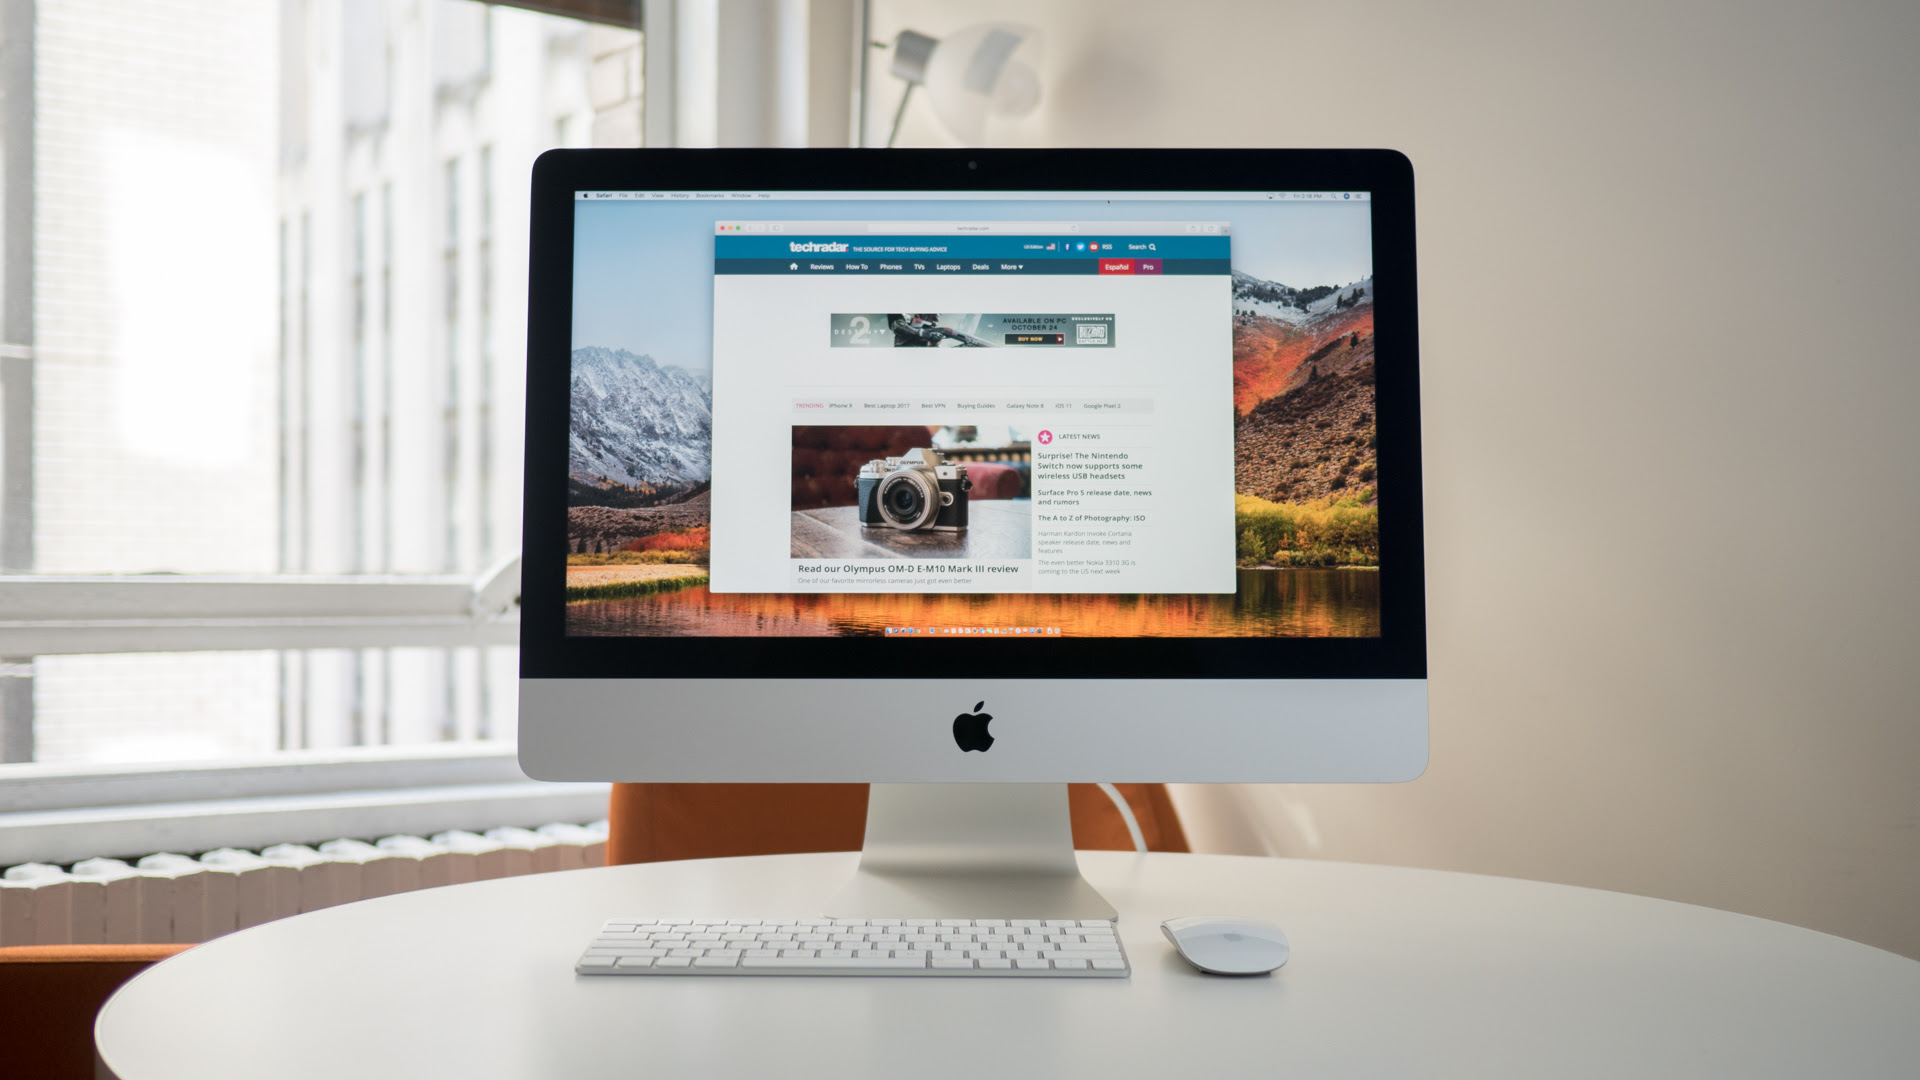 The best macs to buy in 2017 apple 39 s top imacs macbooks - Desk for imac inch ...